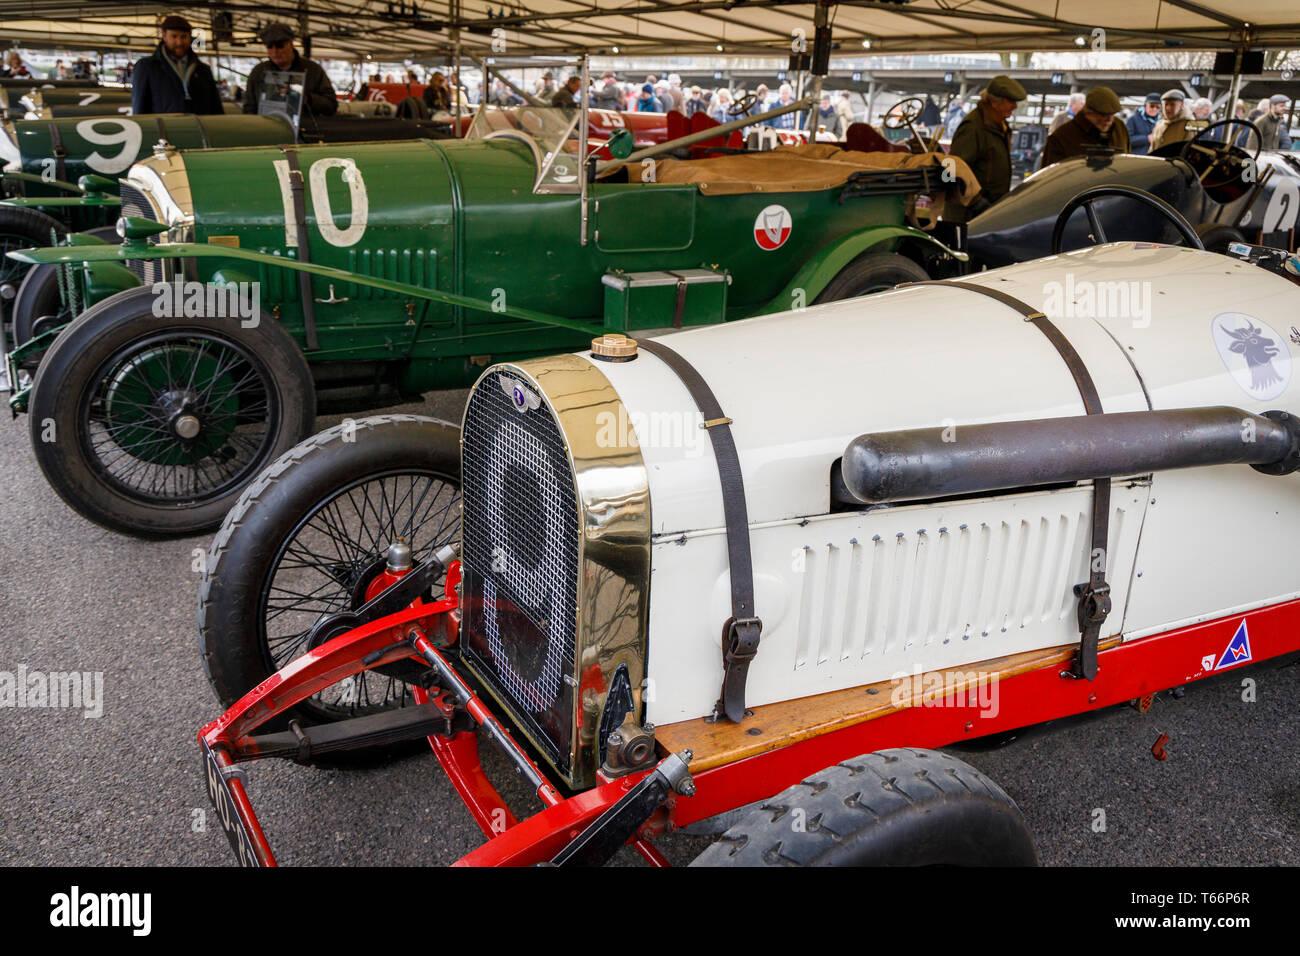 Vintage Bentleys in the paddock garage before the John Duff Trophy race at the 77th Goodwood GRRC Members Meeting, Sussex, UK. - Stock Image